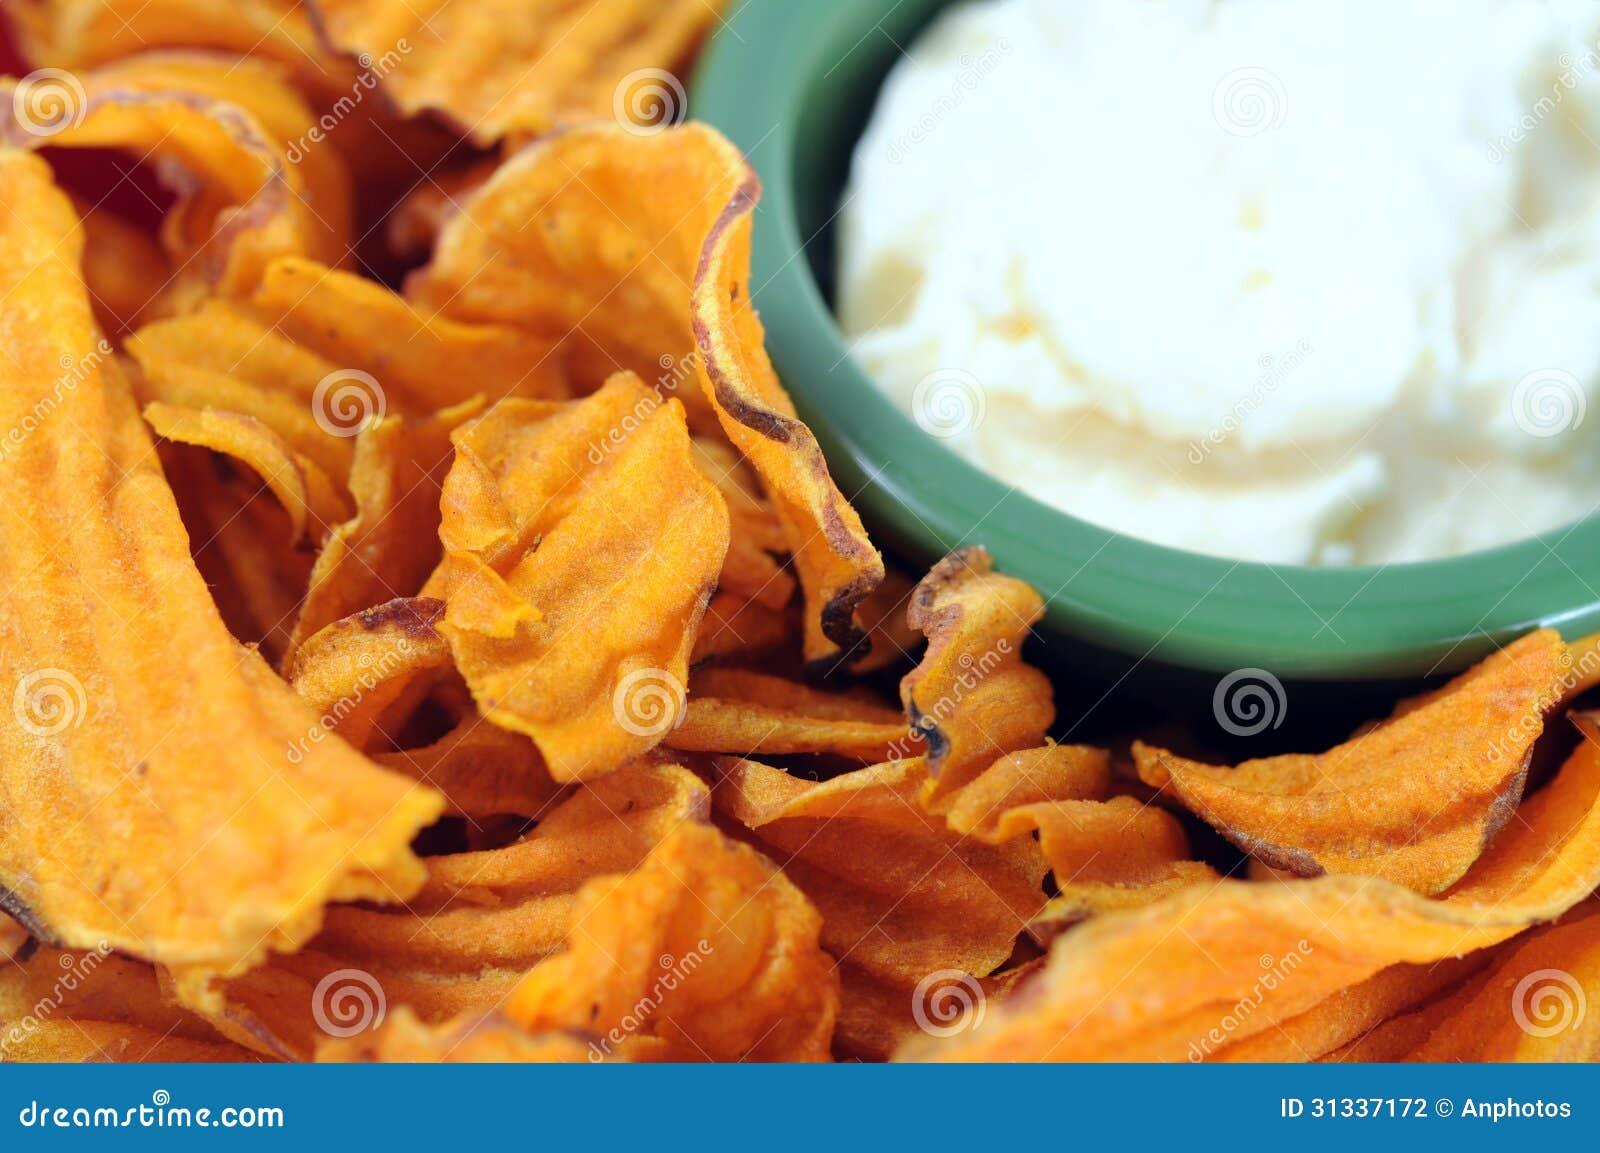 potato-chip-chips-onion-dip-31337172.jpg